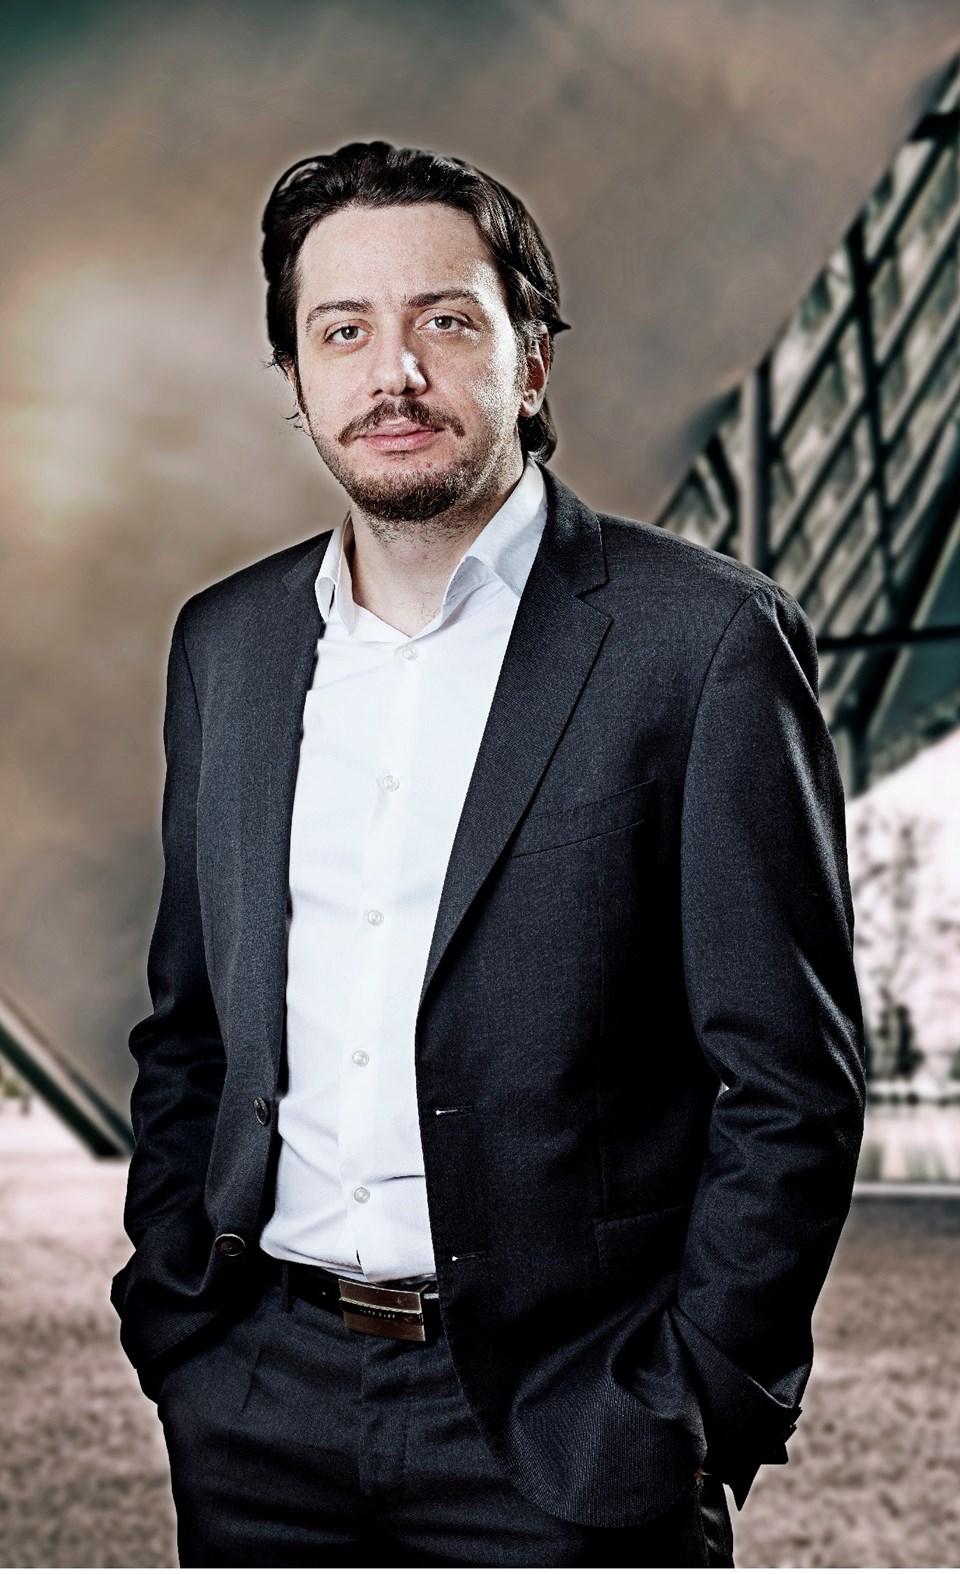 İHS Teknoloji CEO'su Bülent Özkan